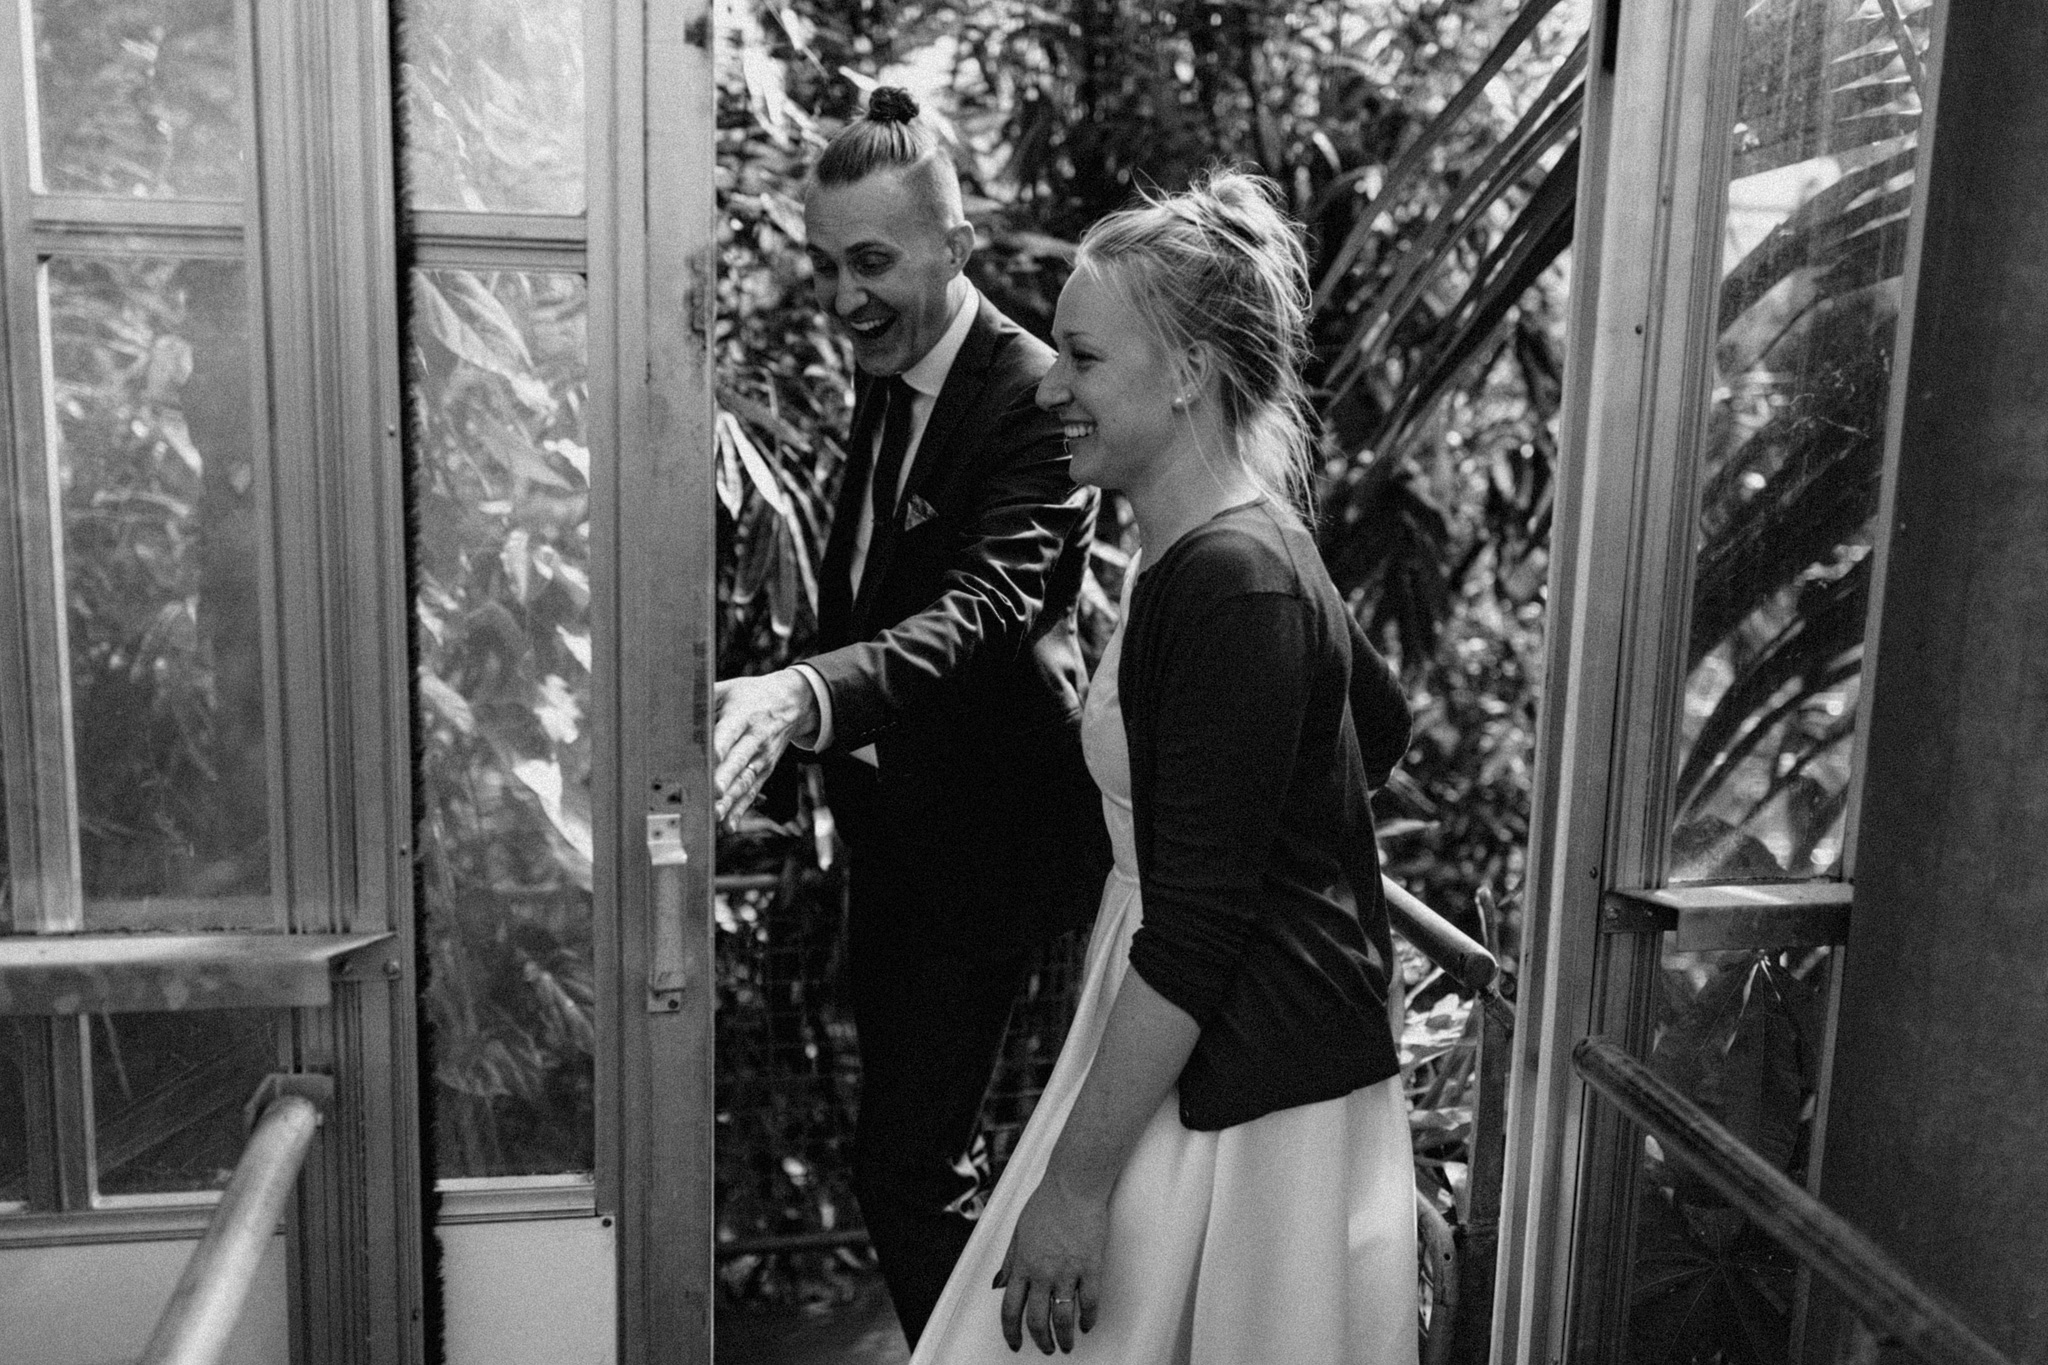 Elopement couple smiling and laughing while walking through Hortus Botanicus Amsterdam